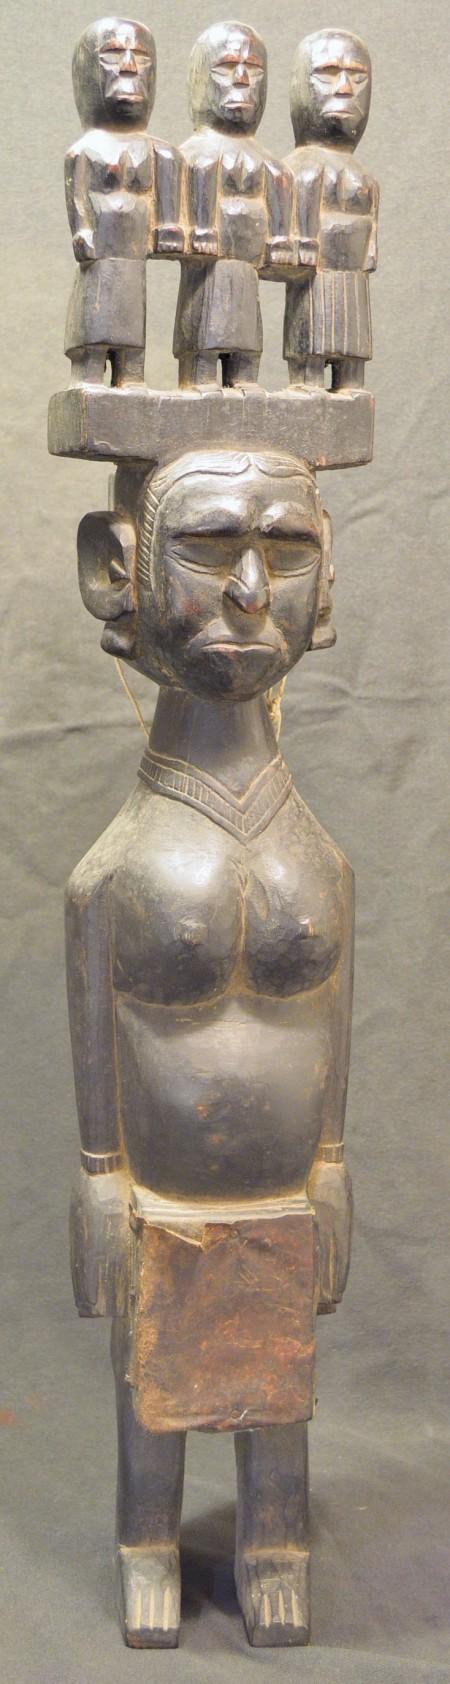 statua tribale